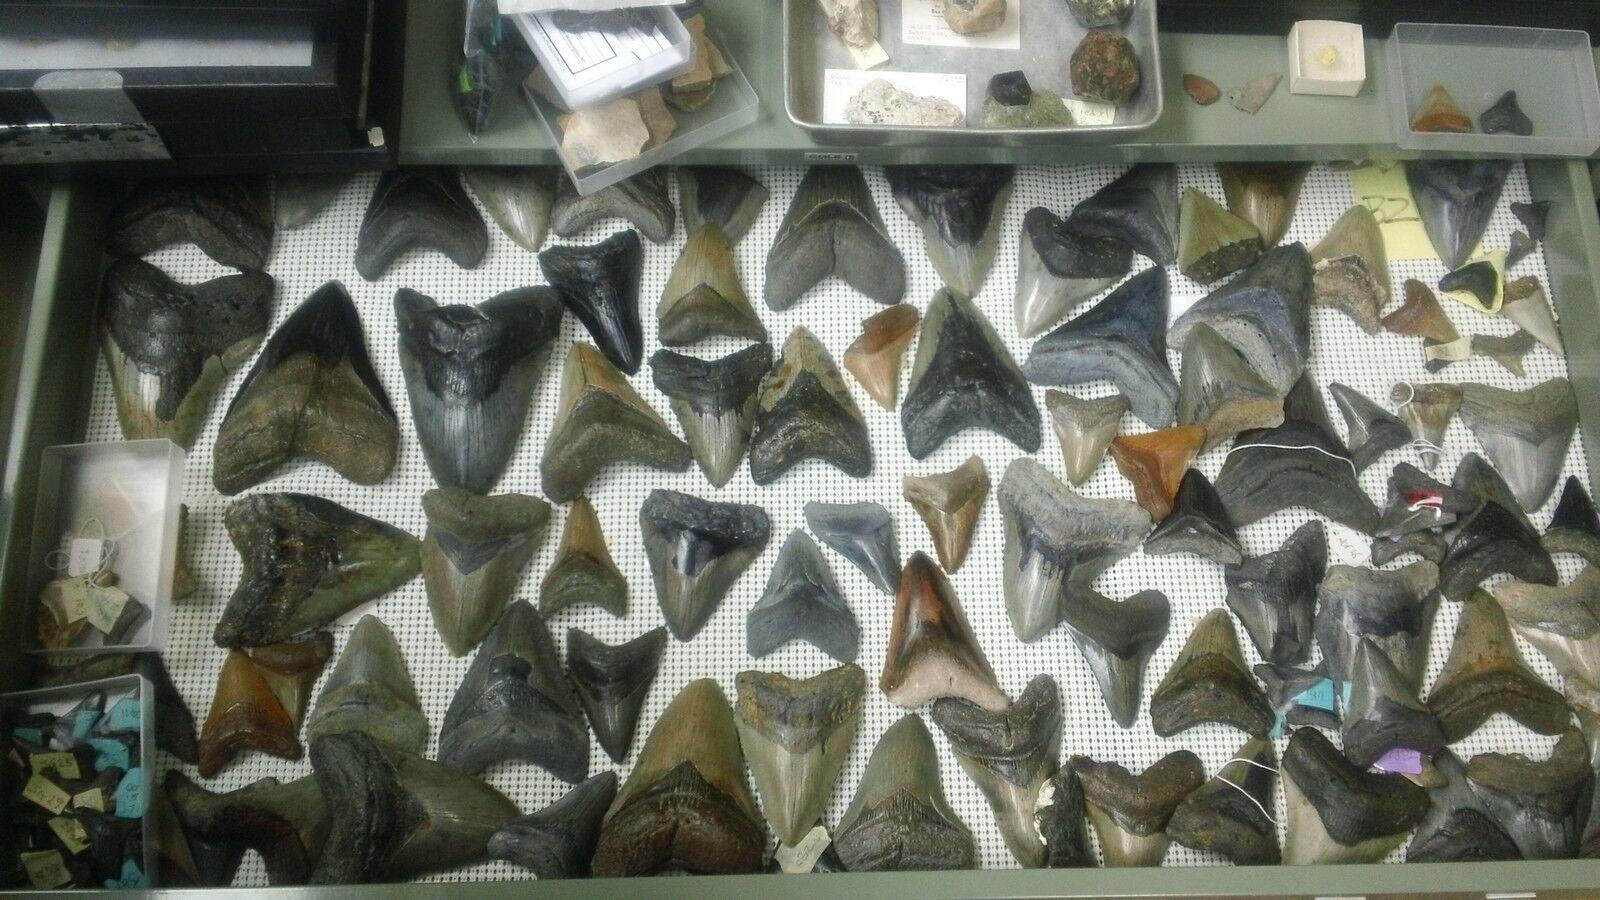 Megalofossils ncfossils@gmail.com